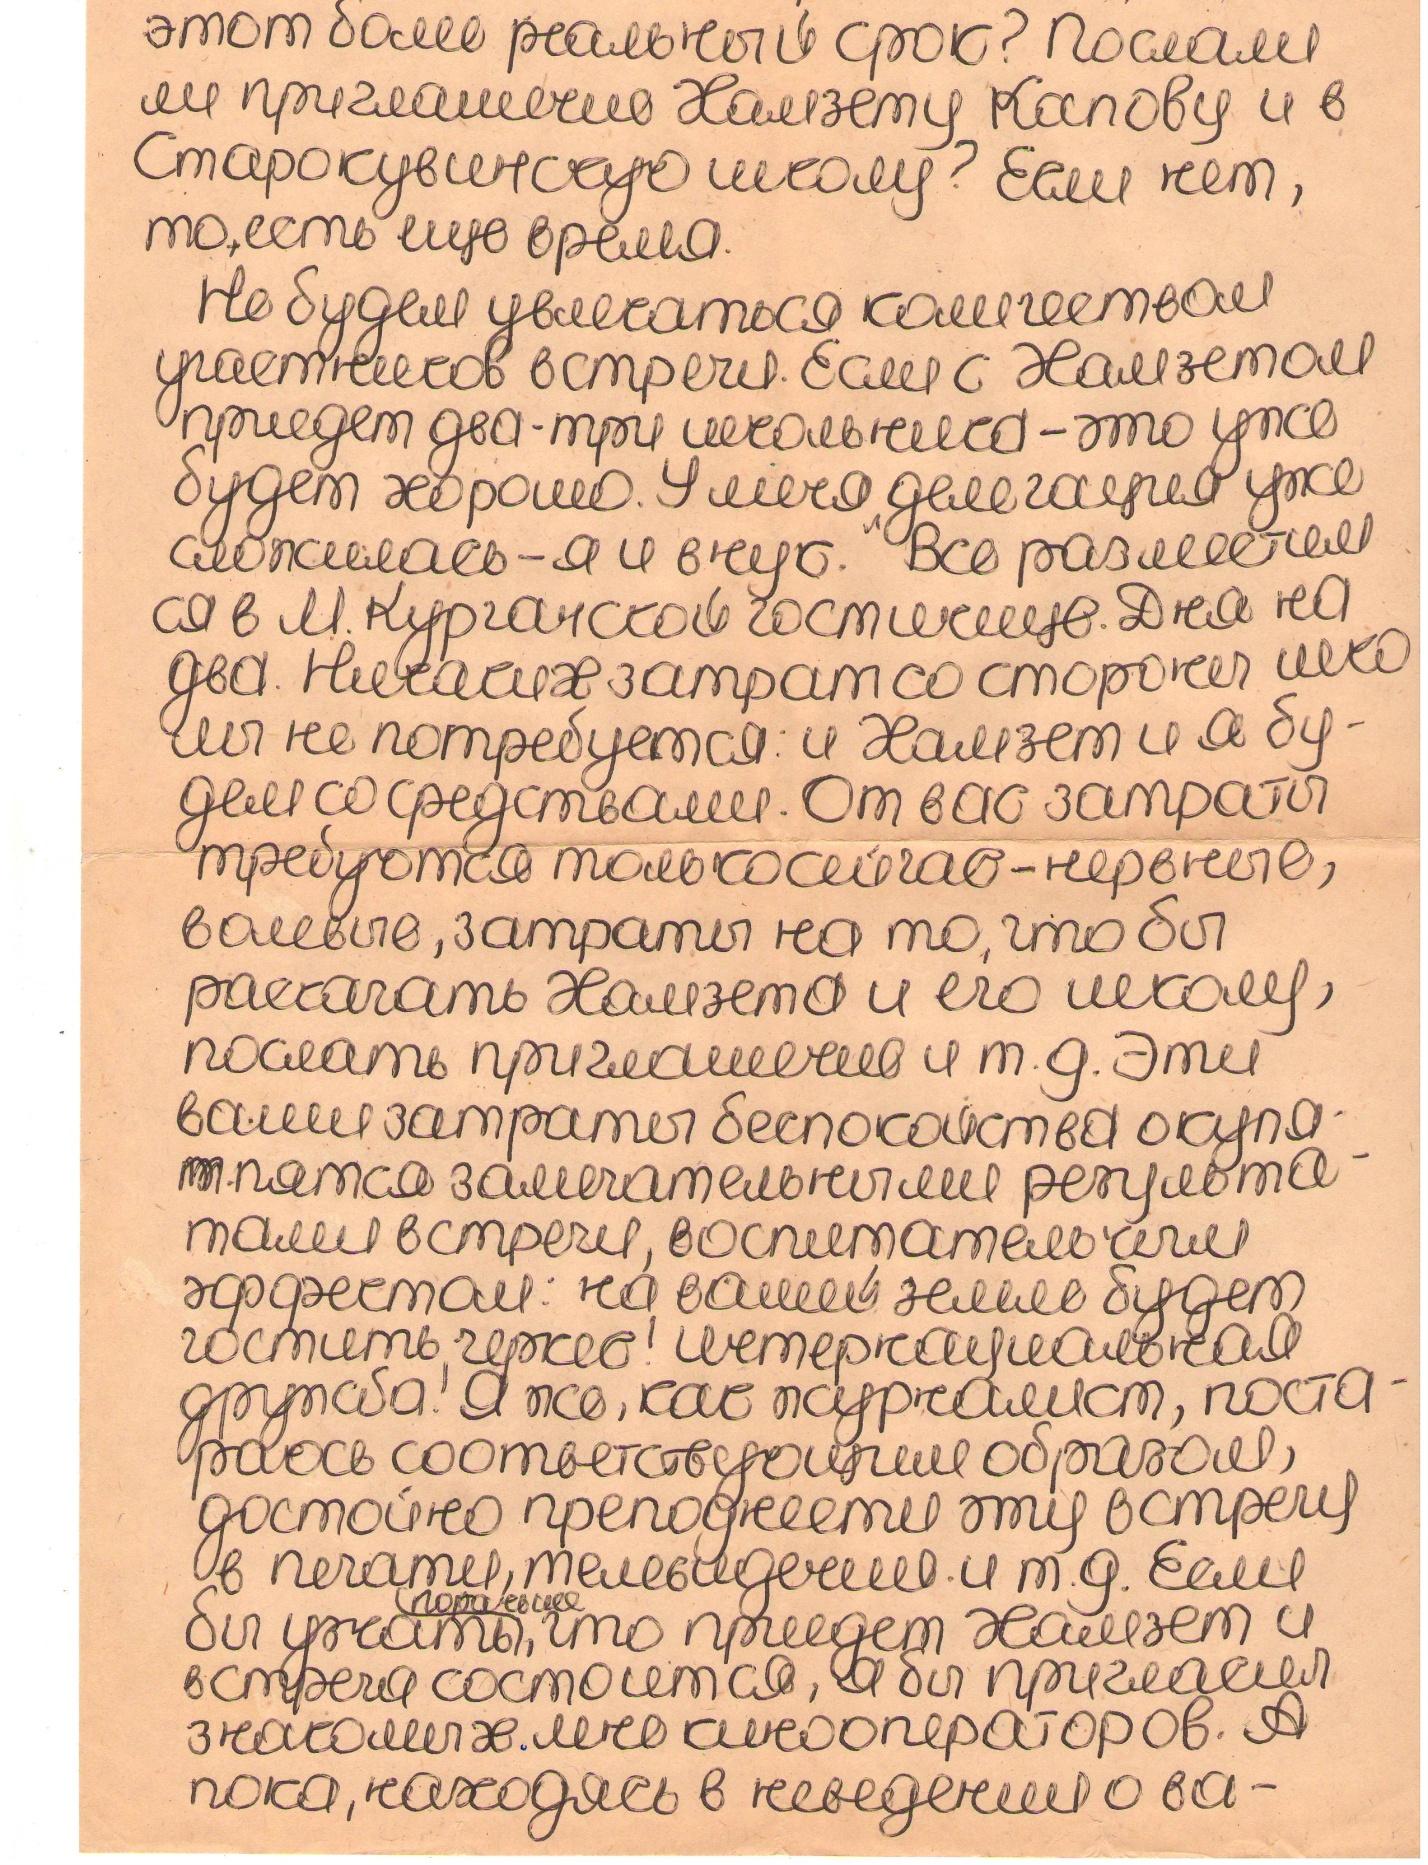 C:\Documents and Settings\СоцПед\Рабочий стол\2013-11-18\21.06.1988\Изображение0006.JPG